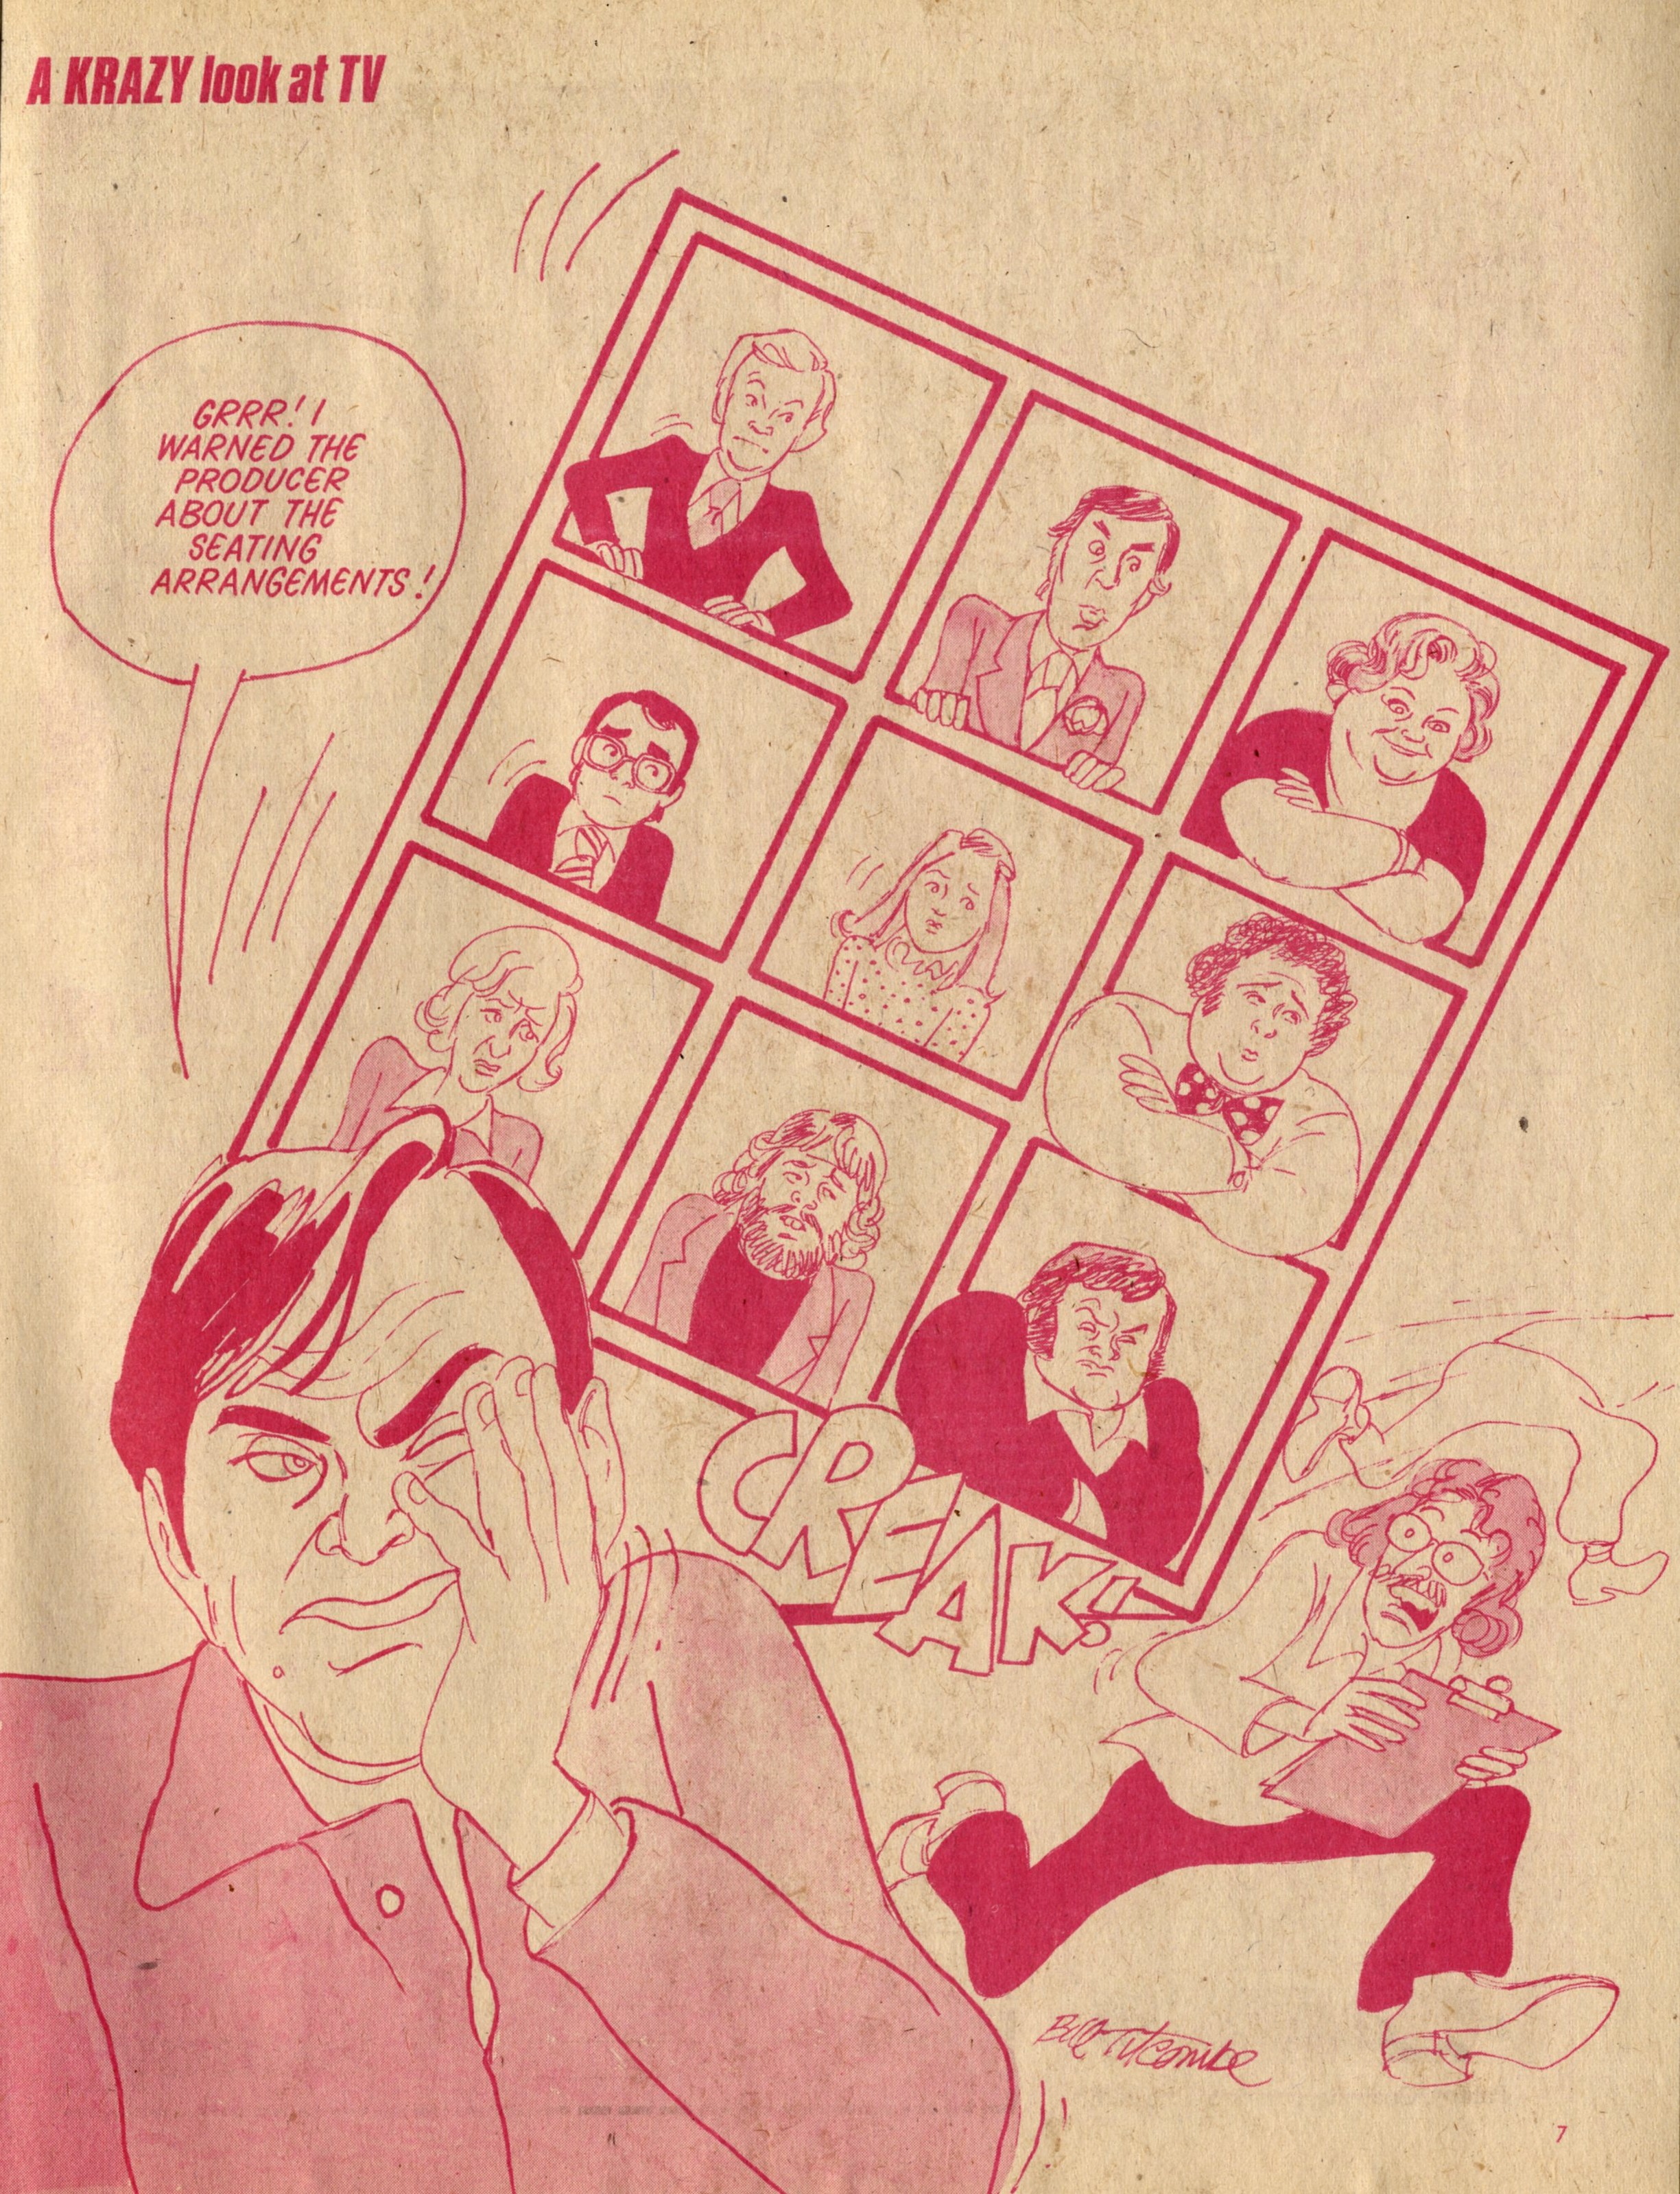 A Krazy Look at TV: Bill Titcombe (artist)